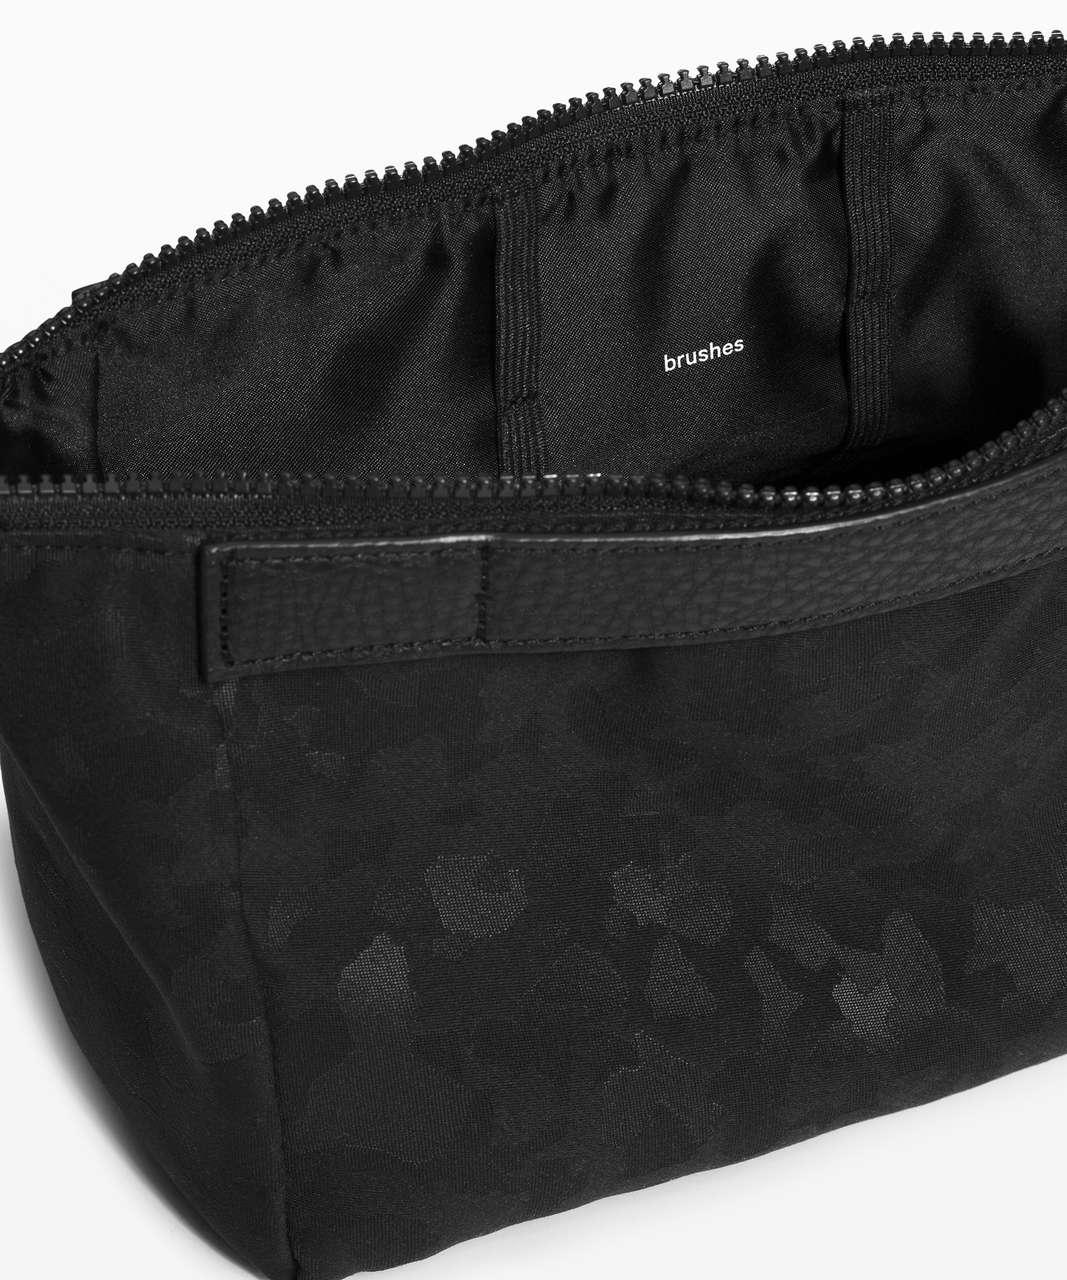 Lululemon Travel Easy Kit *4.5L - Fragment Camo Jacquard Black Deep Coal